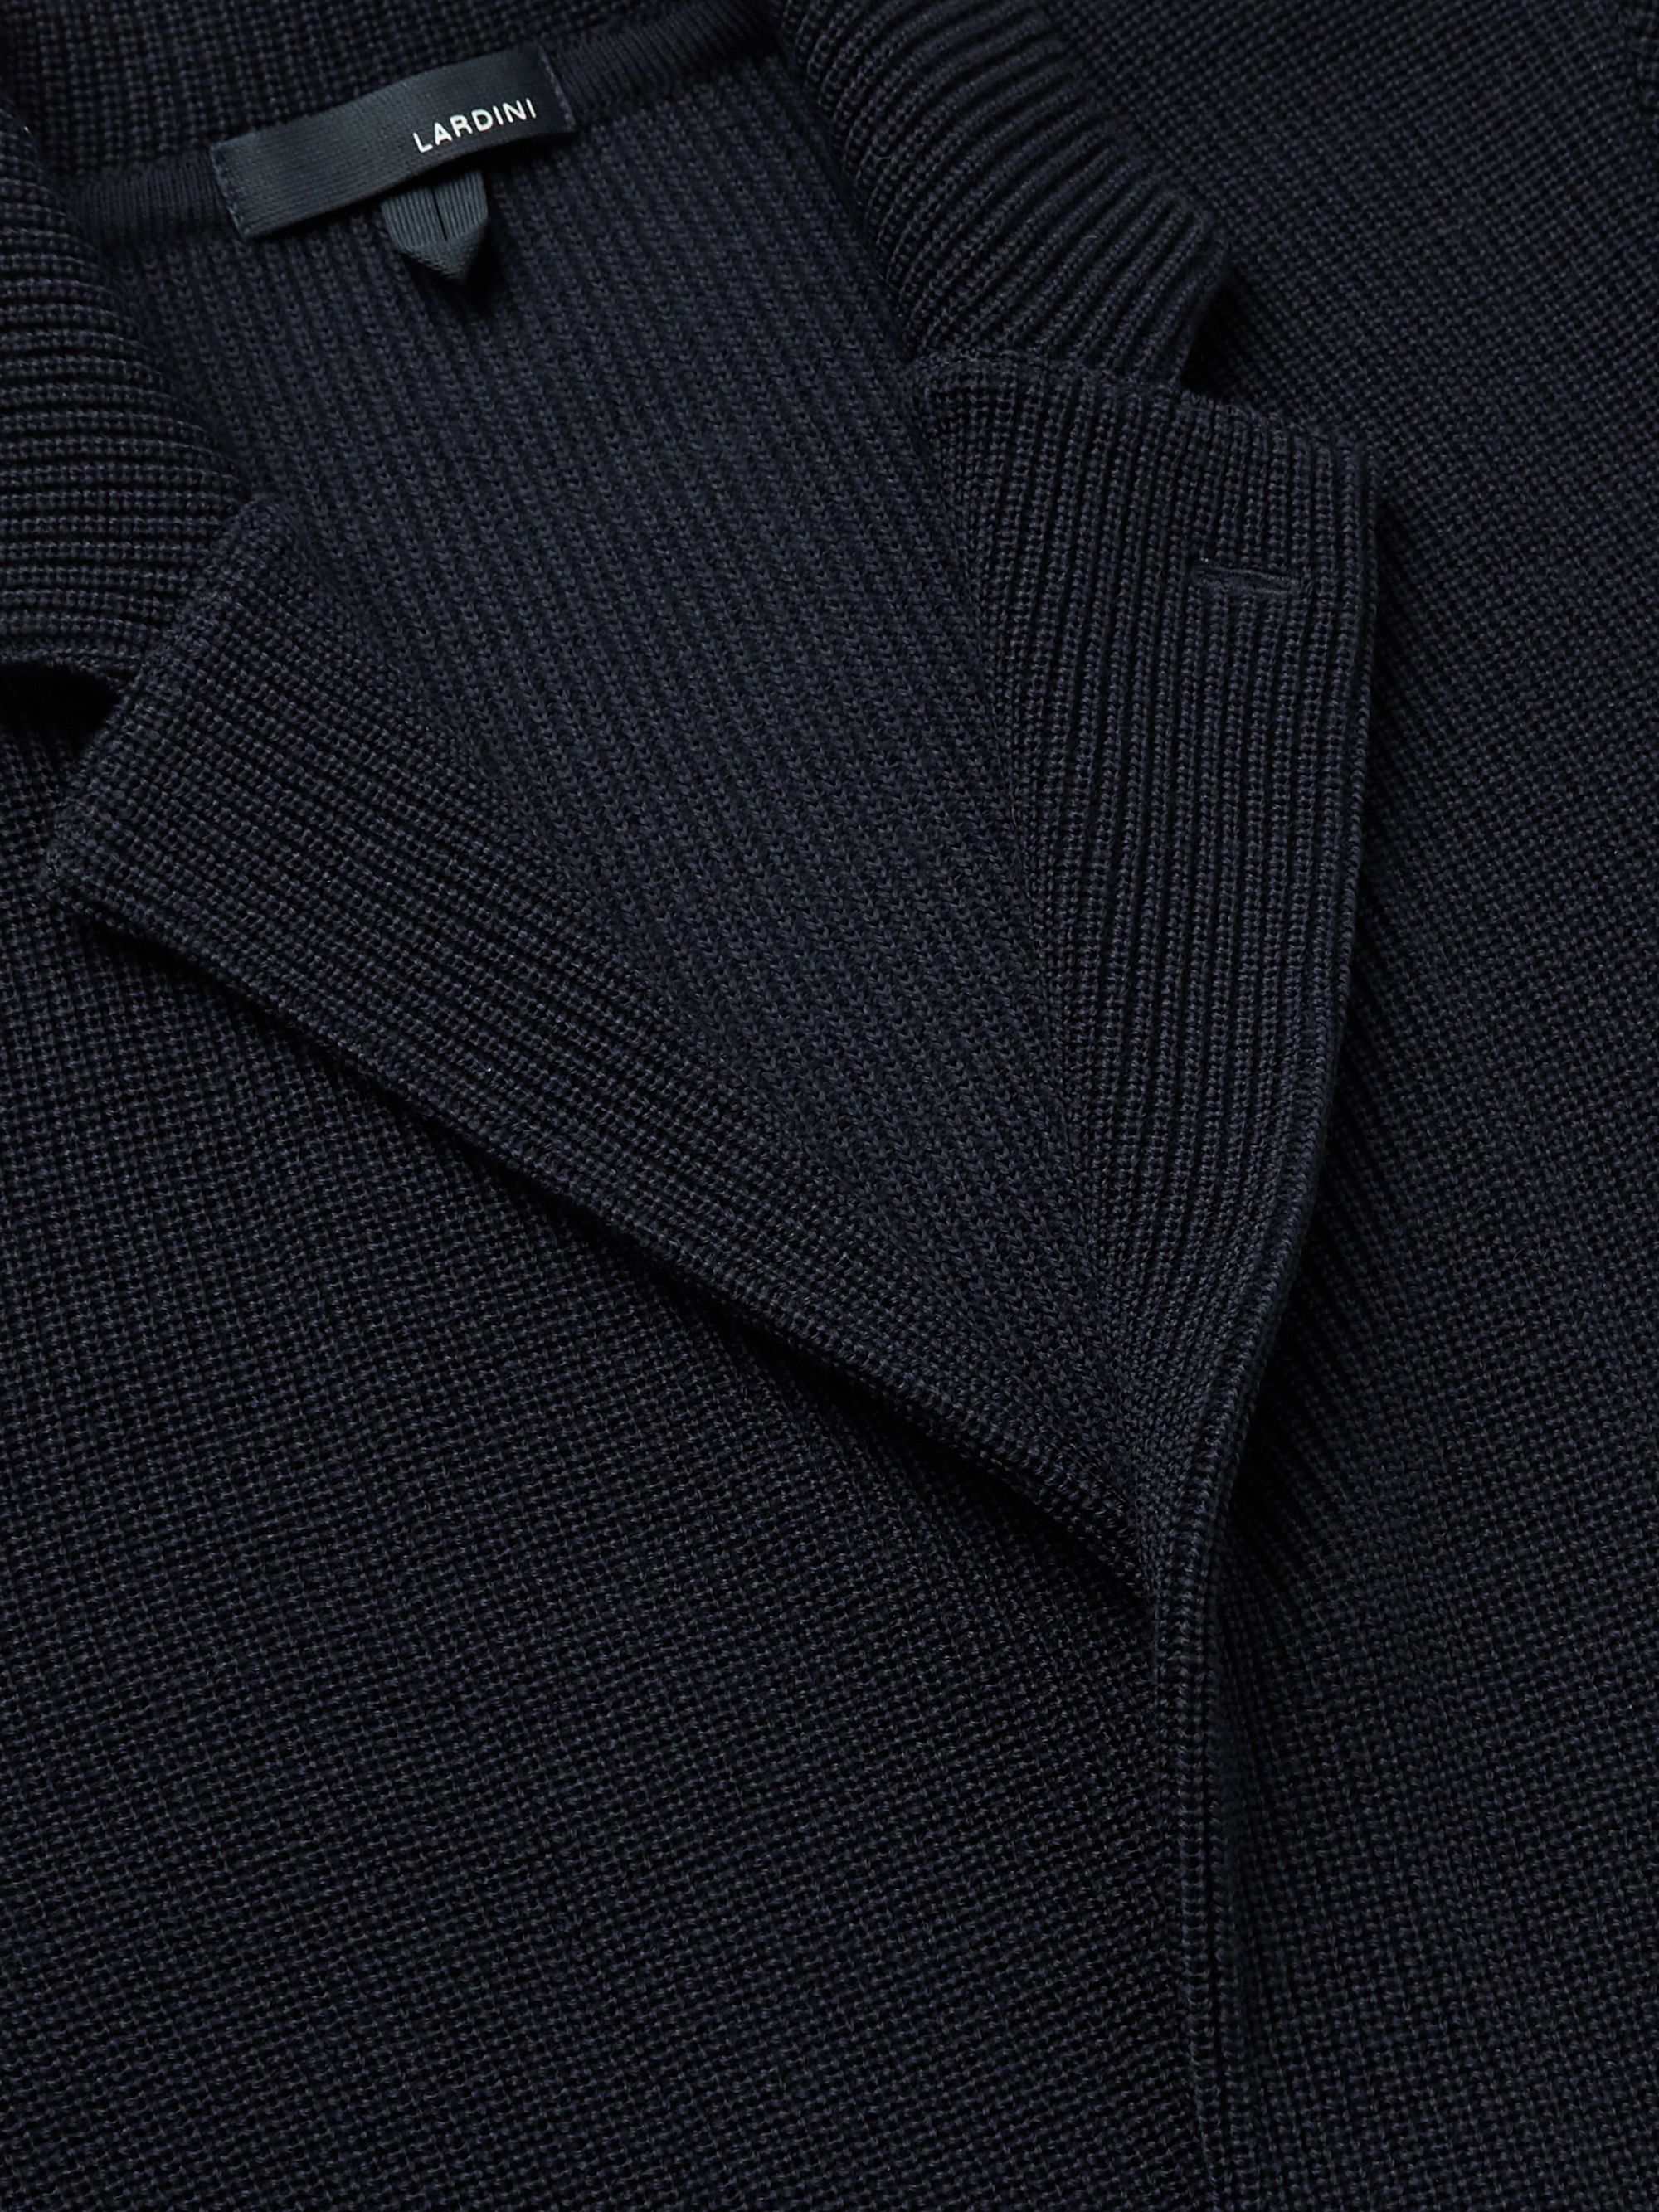 Navy Slim-fit Ribbed Wool Cardigan | Lardini